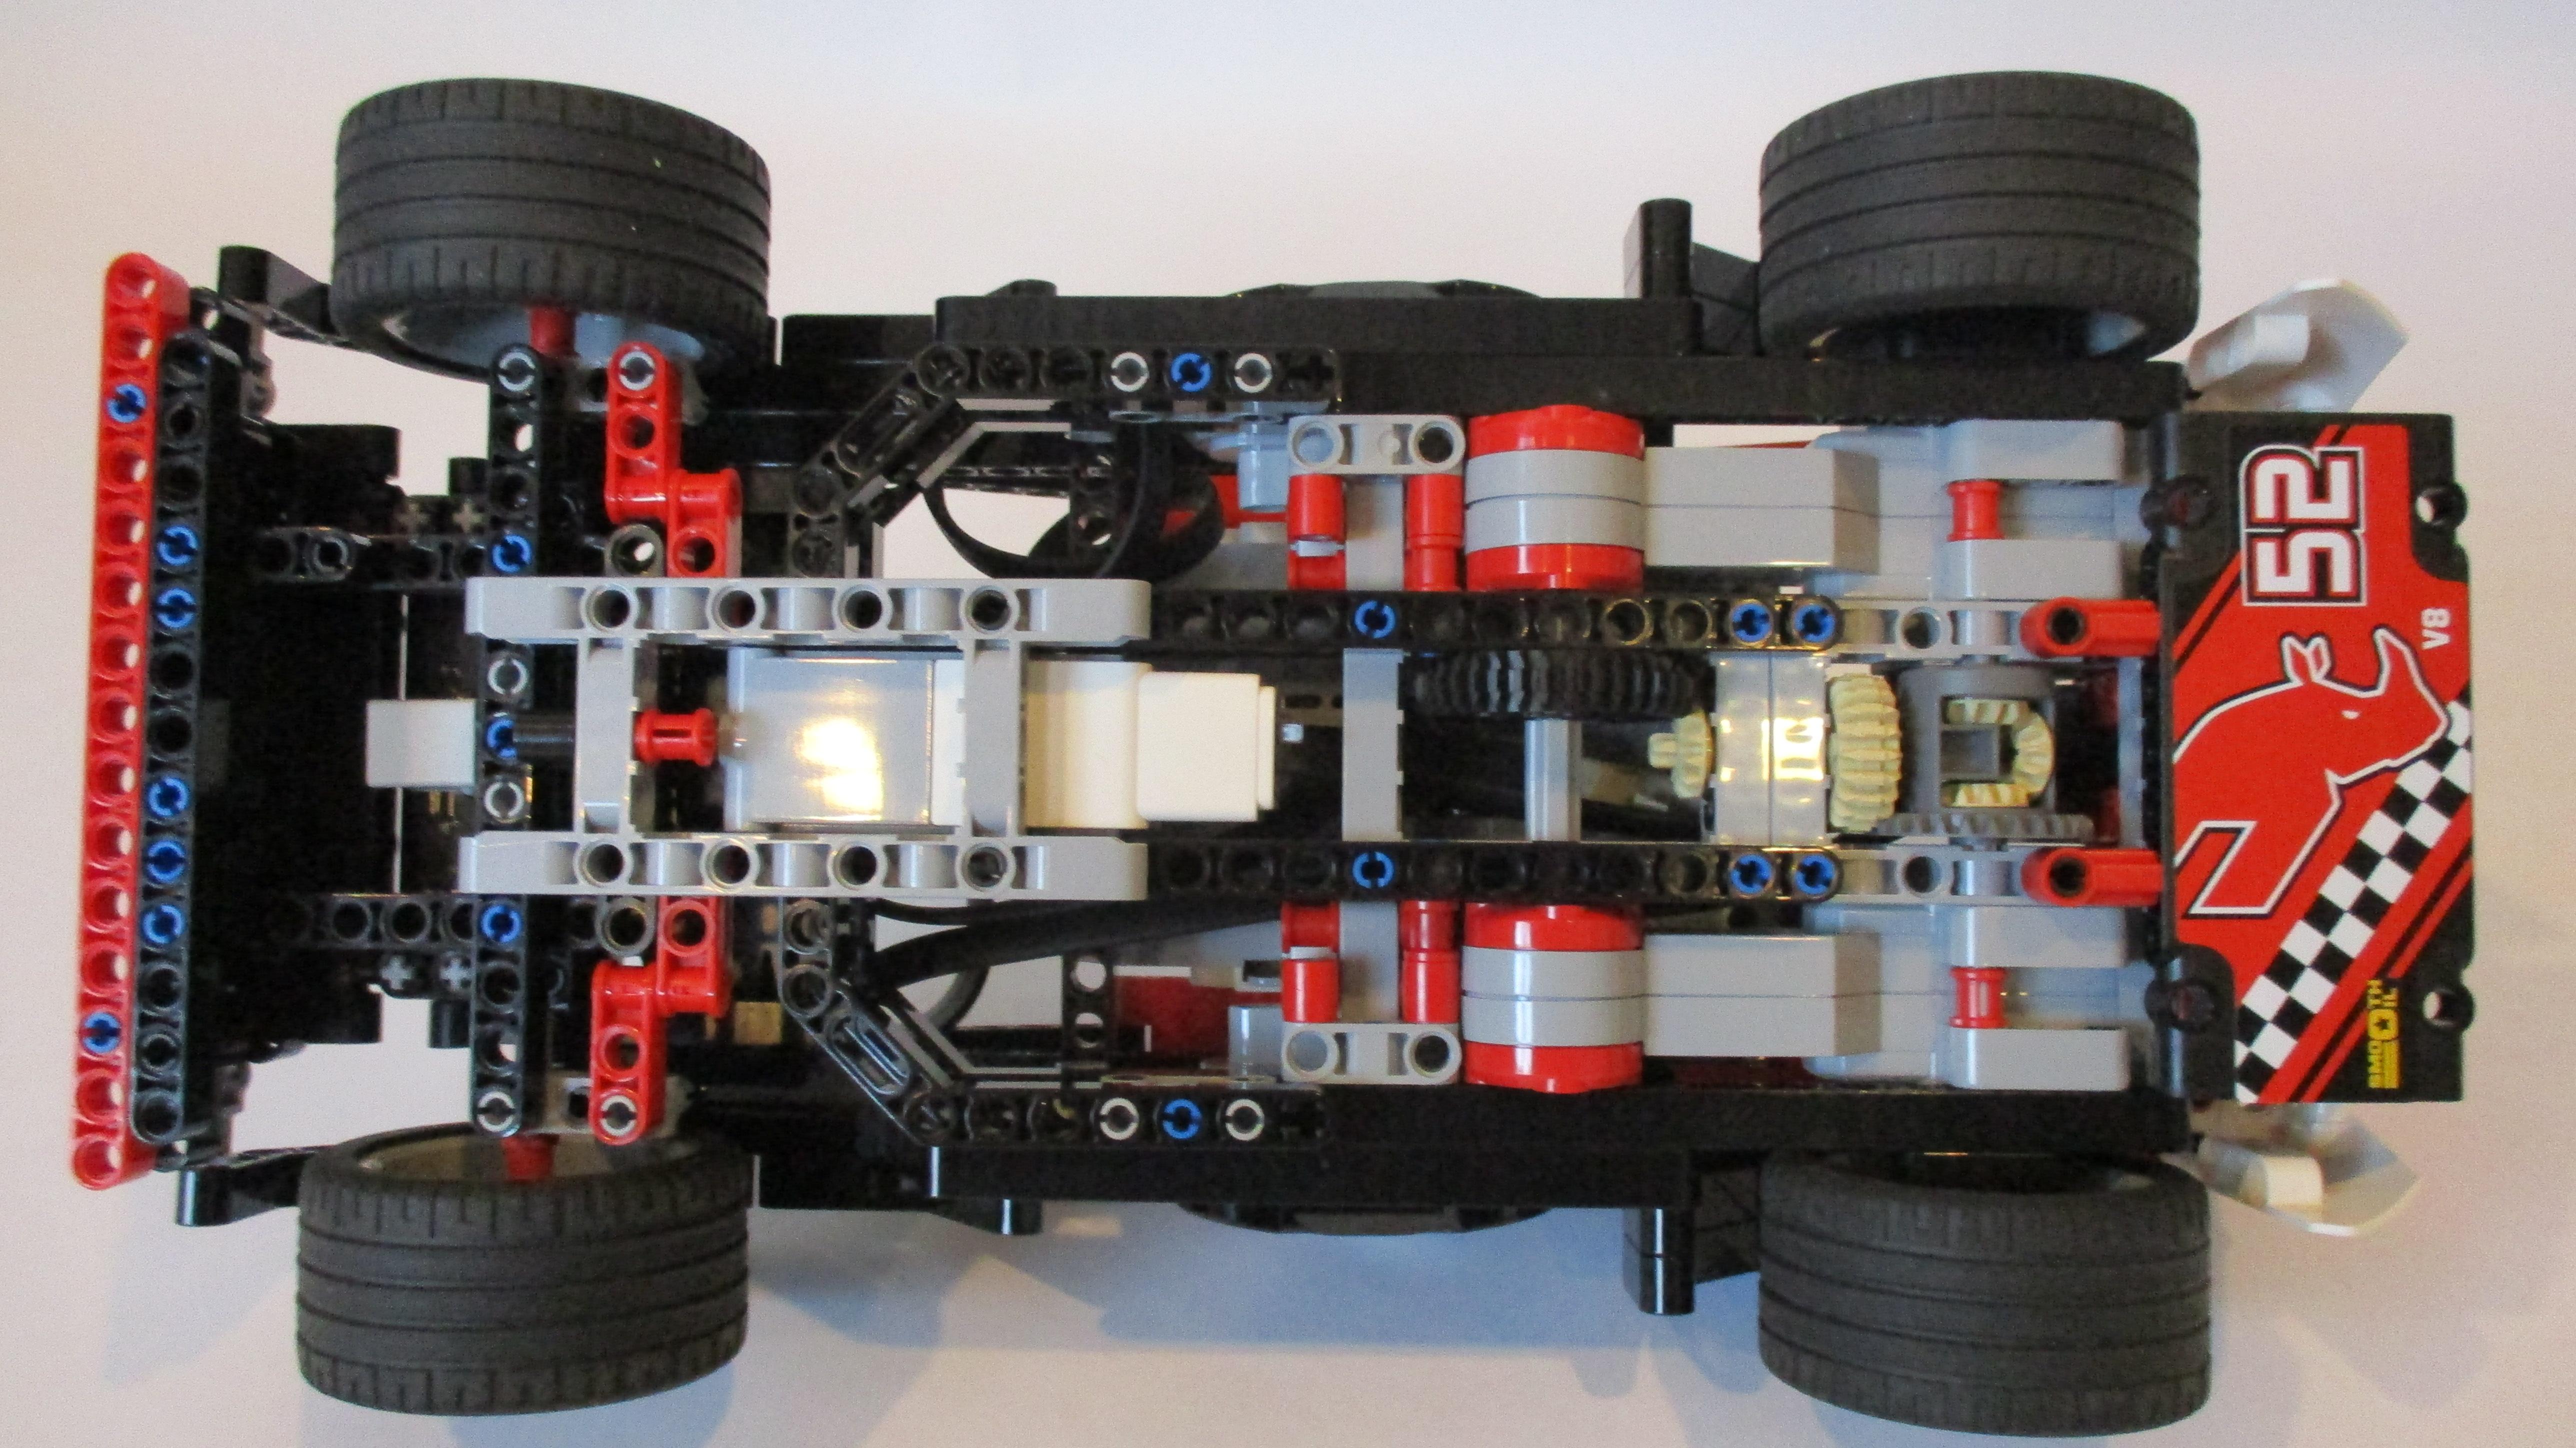 Ev3 Large Motor Lego Quot Fllying Tortoise Quot Ev3 Robot Base